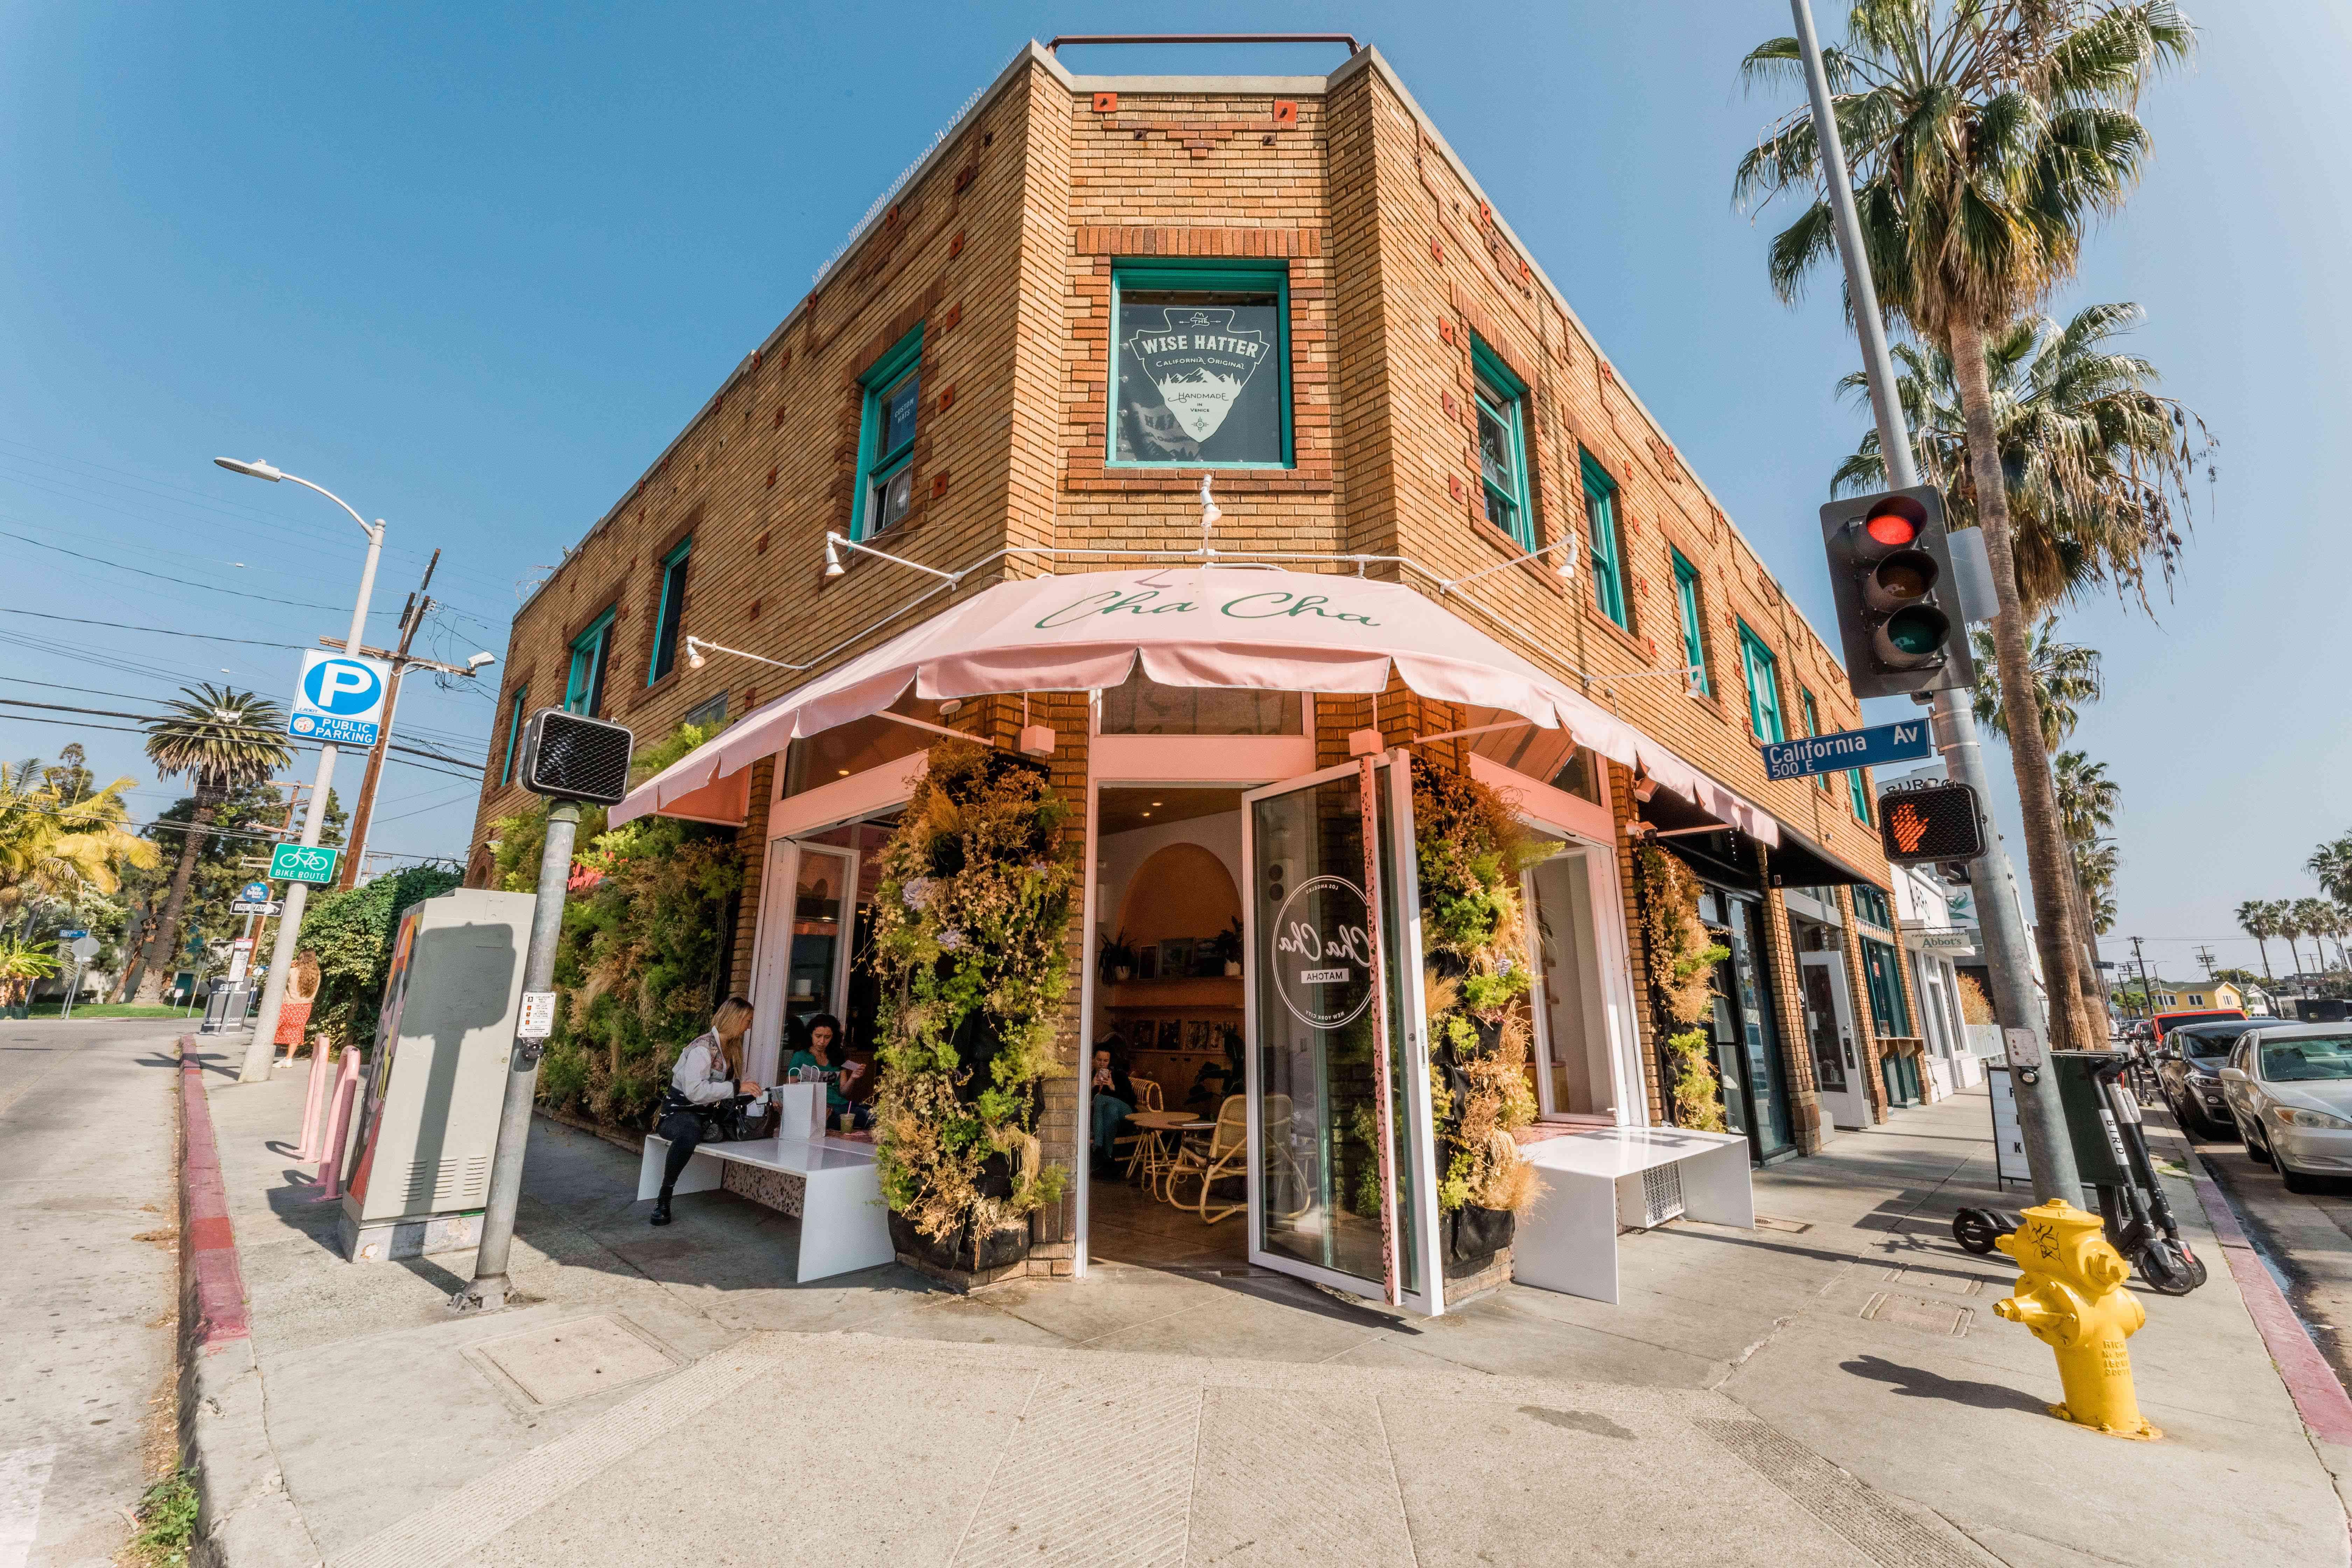 Store on Abbot Kinney Boulevard in Los Angeles, CA